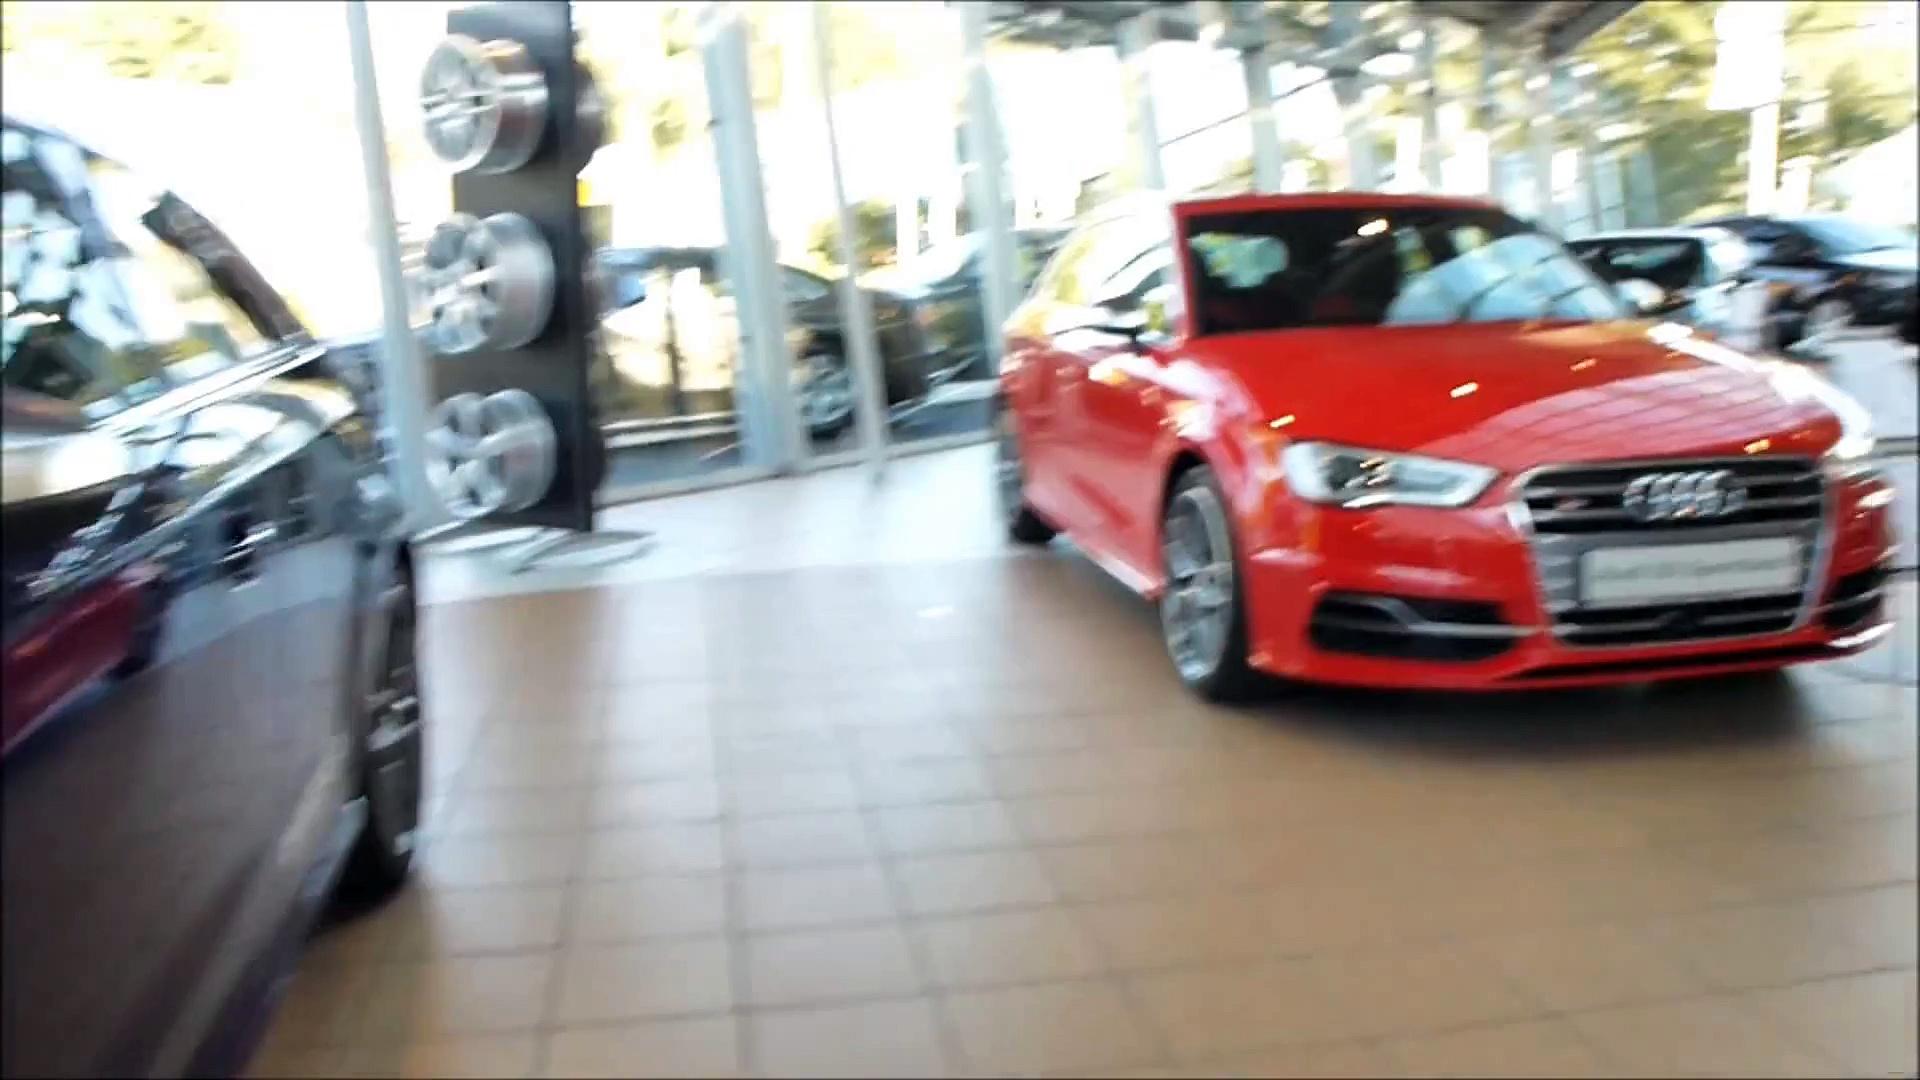 2014 Audi R8 Spyder -Audi S3 -Audi S3 Sportback -Audi RS5 Cabrio -Audi RS7 -Audi RS4 Avant